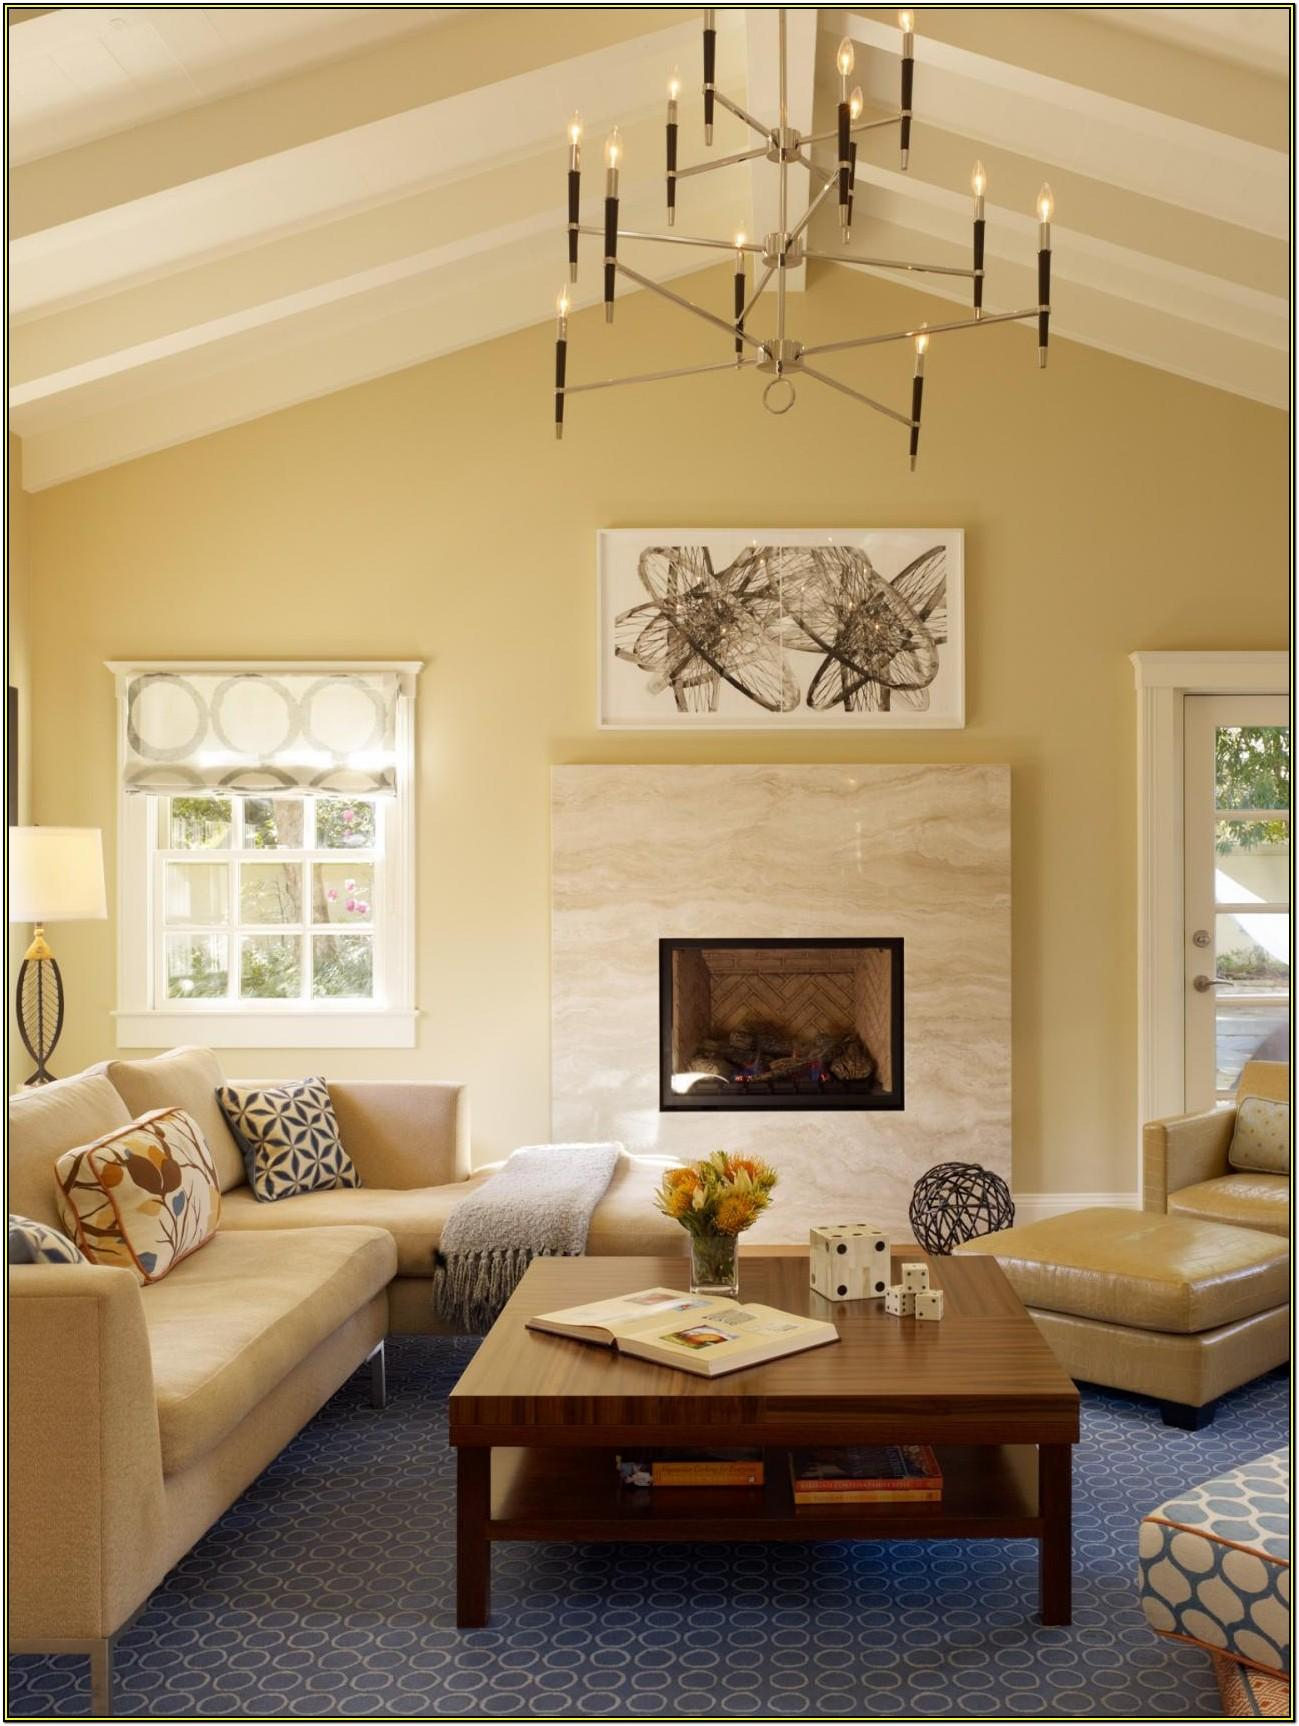 Best Neutral Color For Living Room